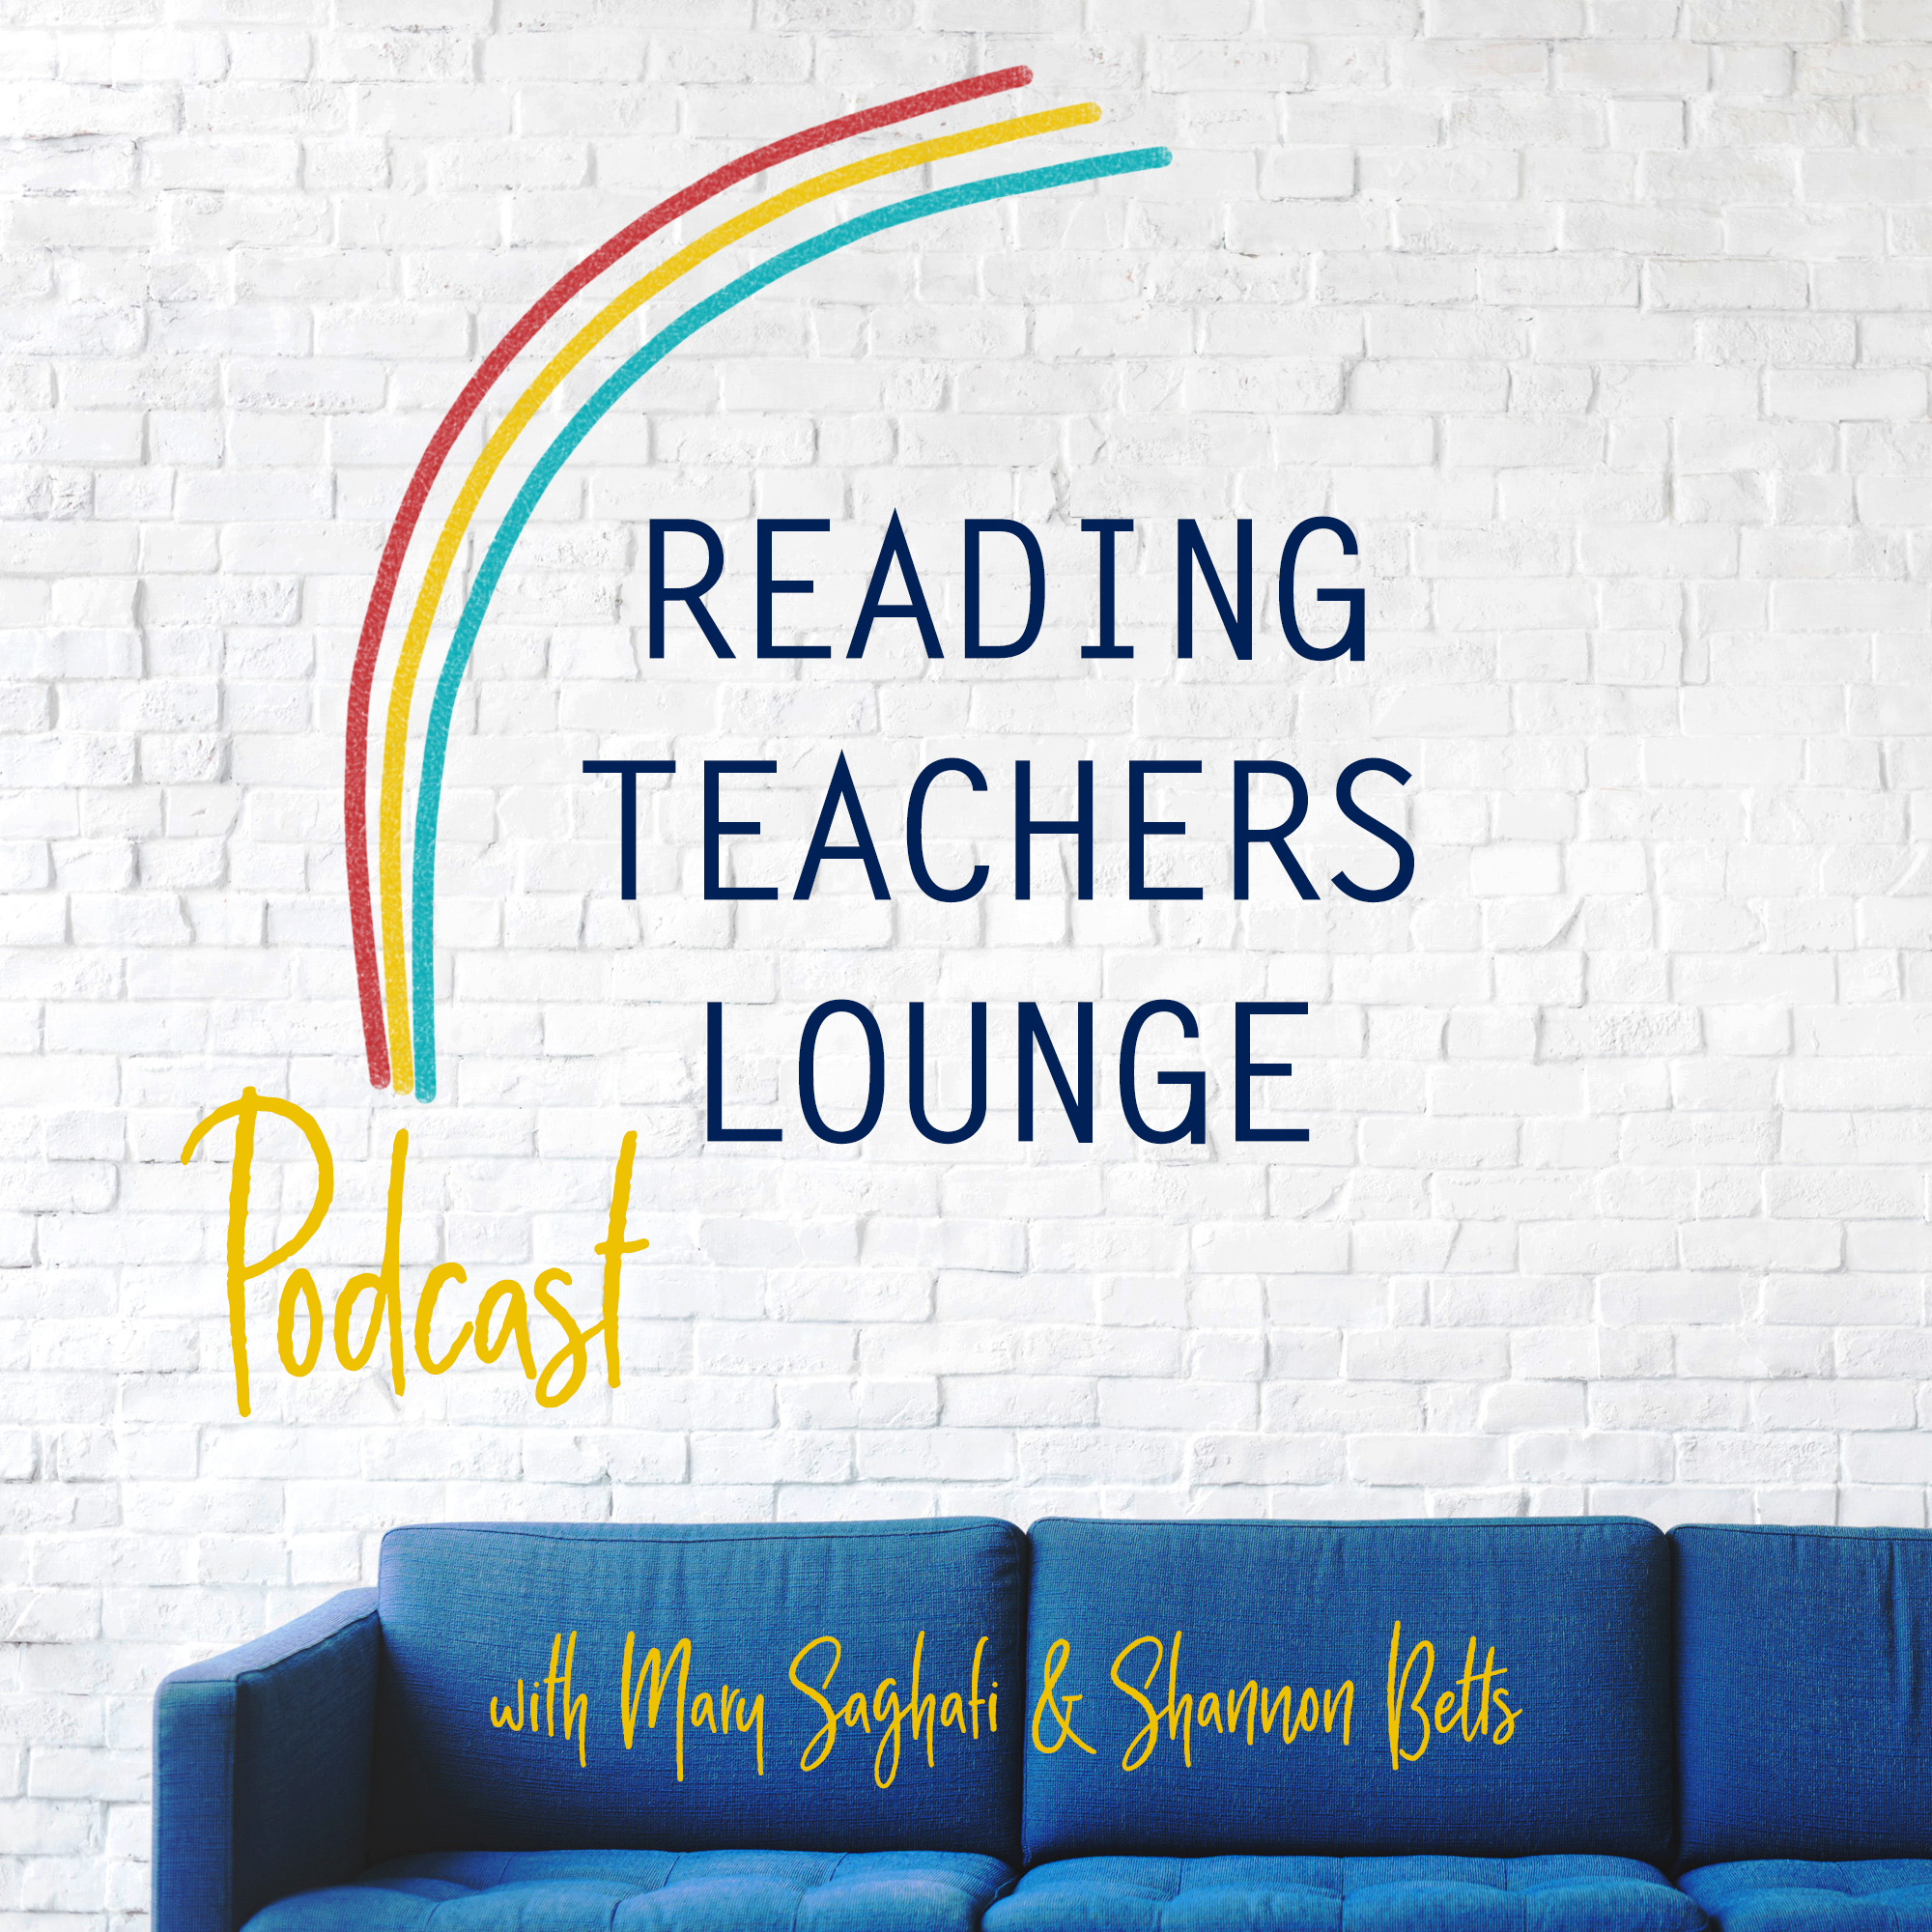 readingteachersloungepodcast.jpg